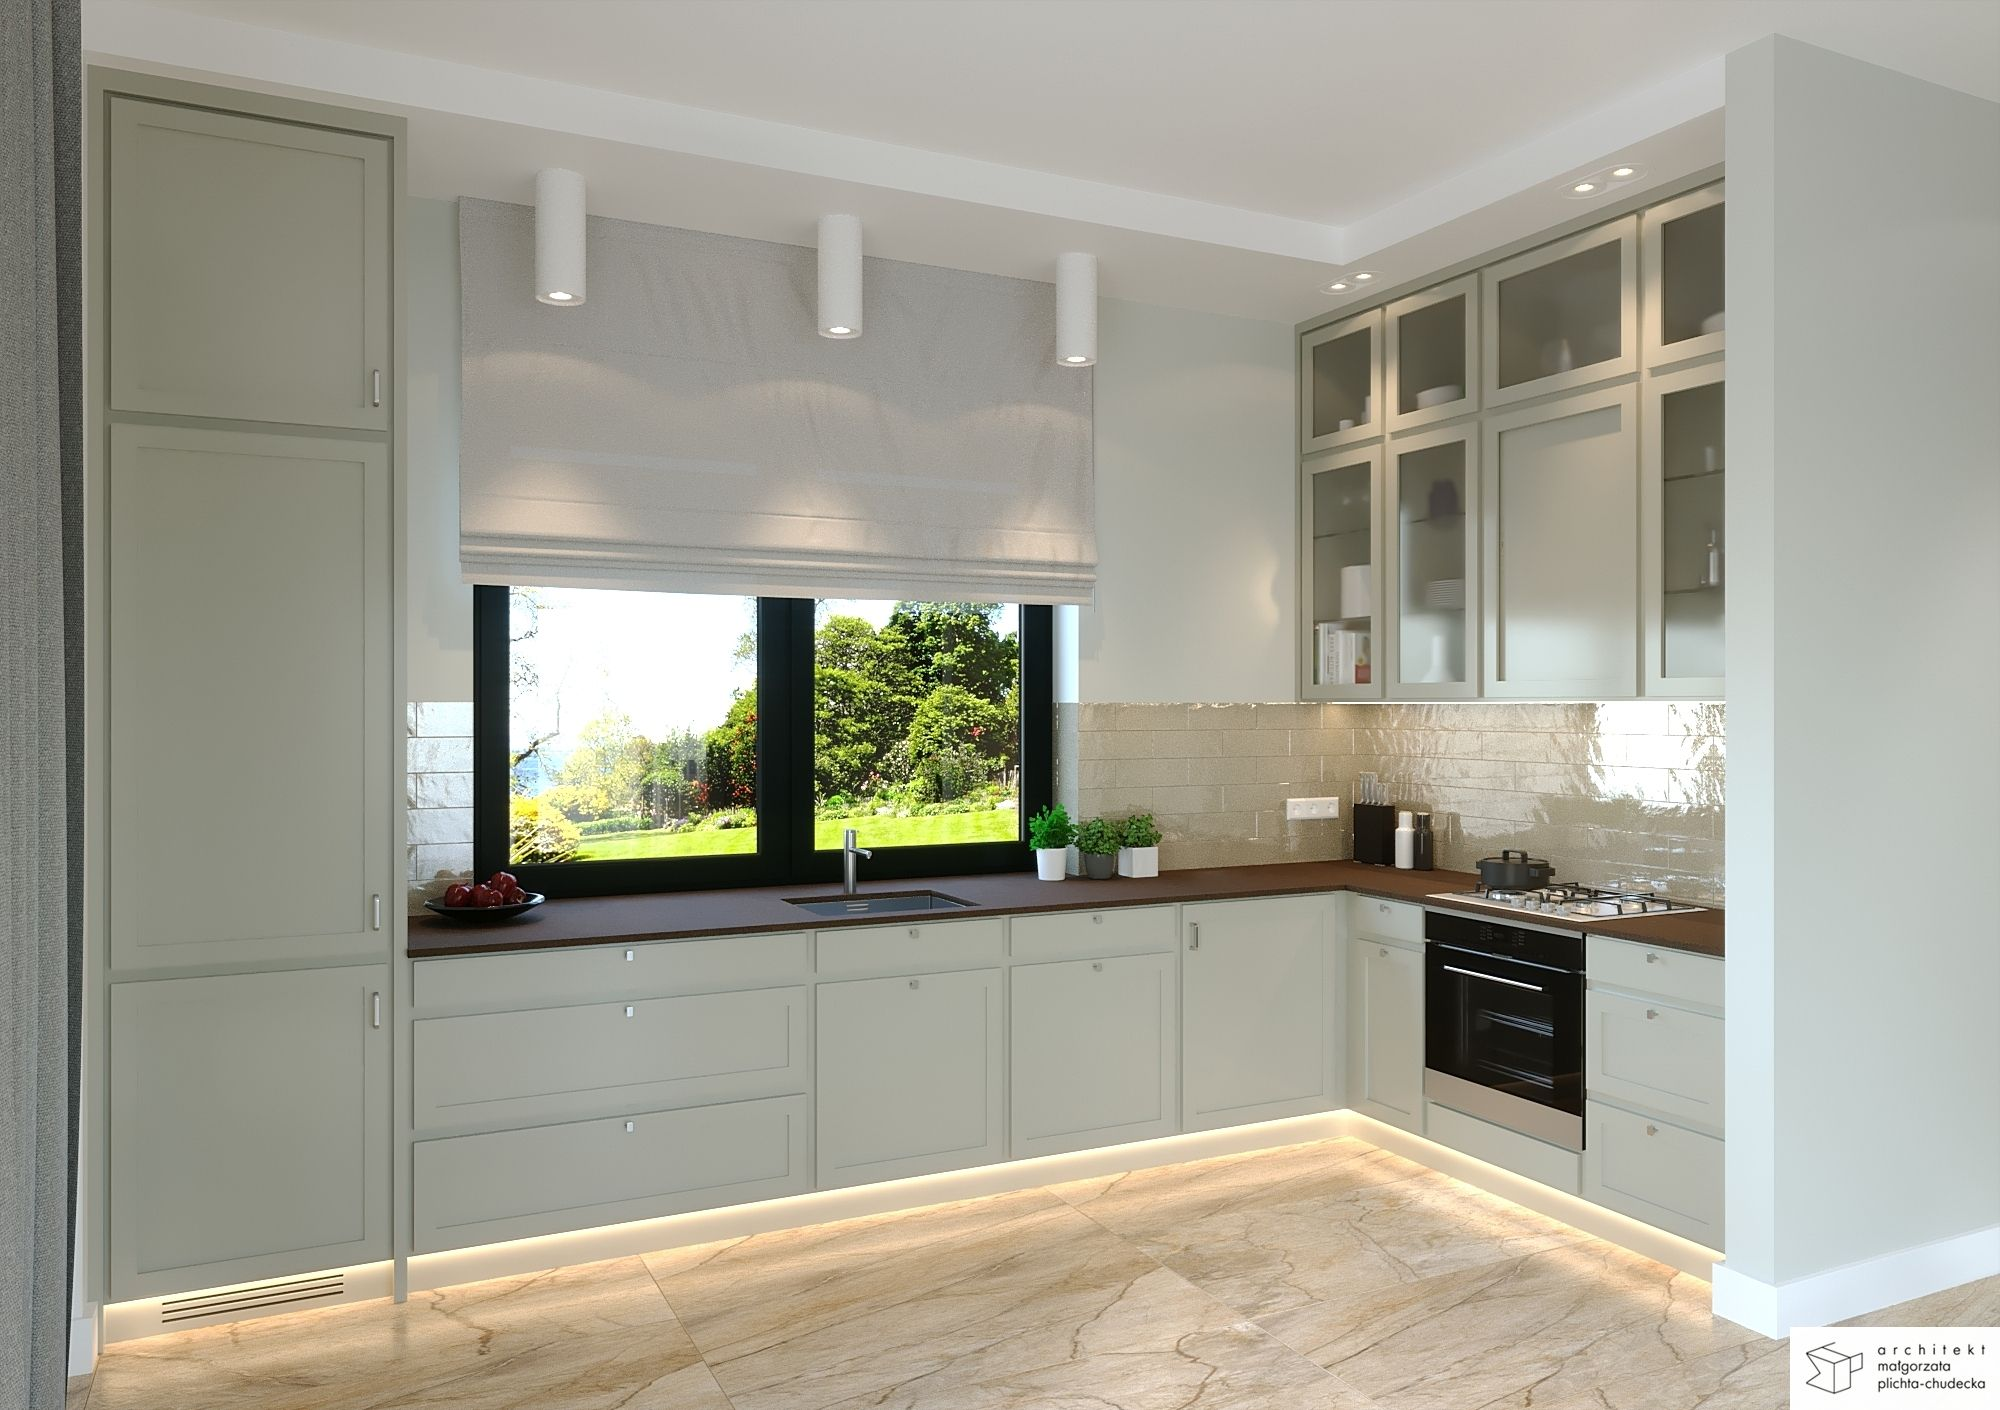 Kuchnia Z Widokiem Na Ogrod Home Home Decor Kitchen